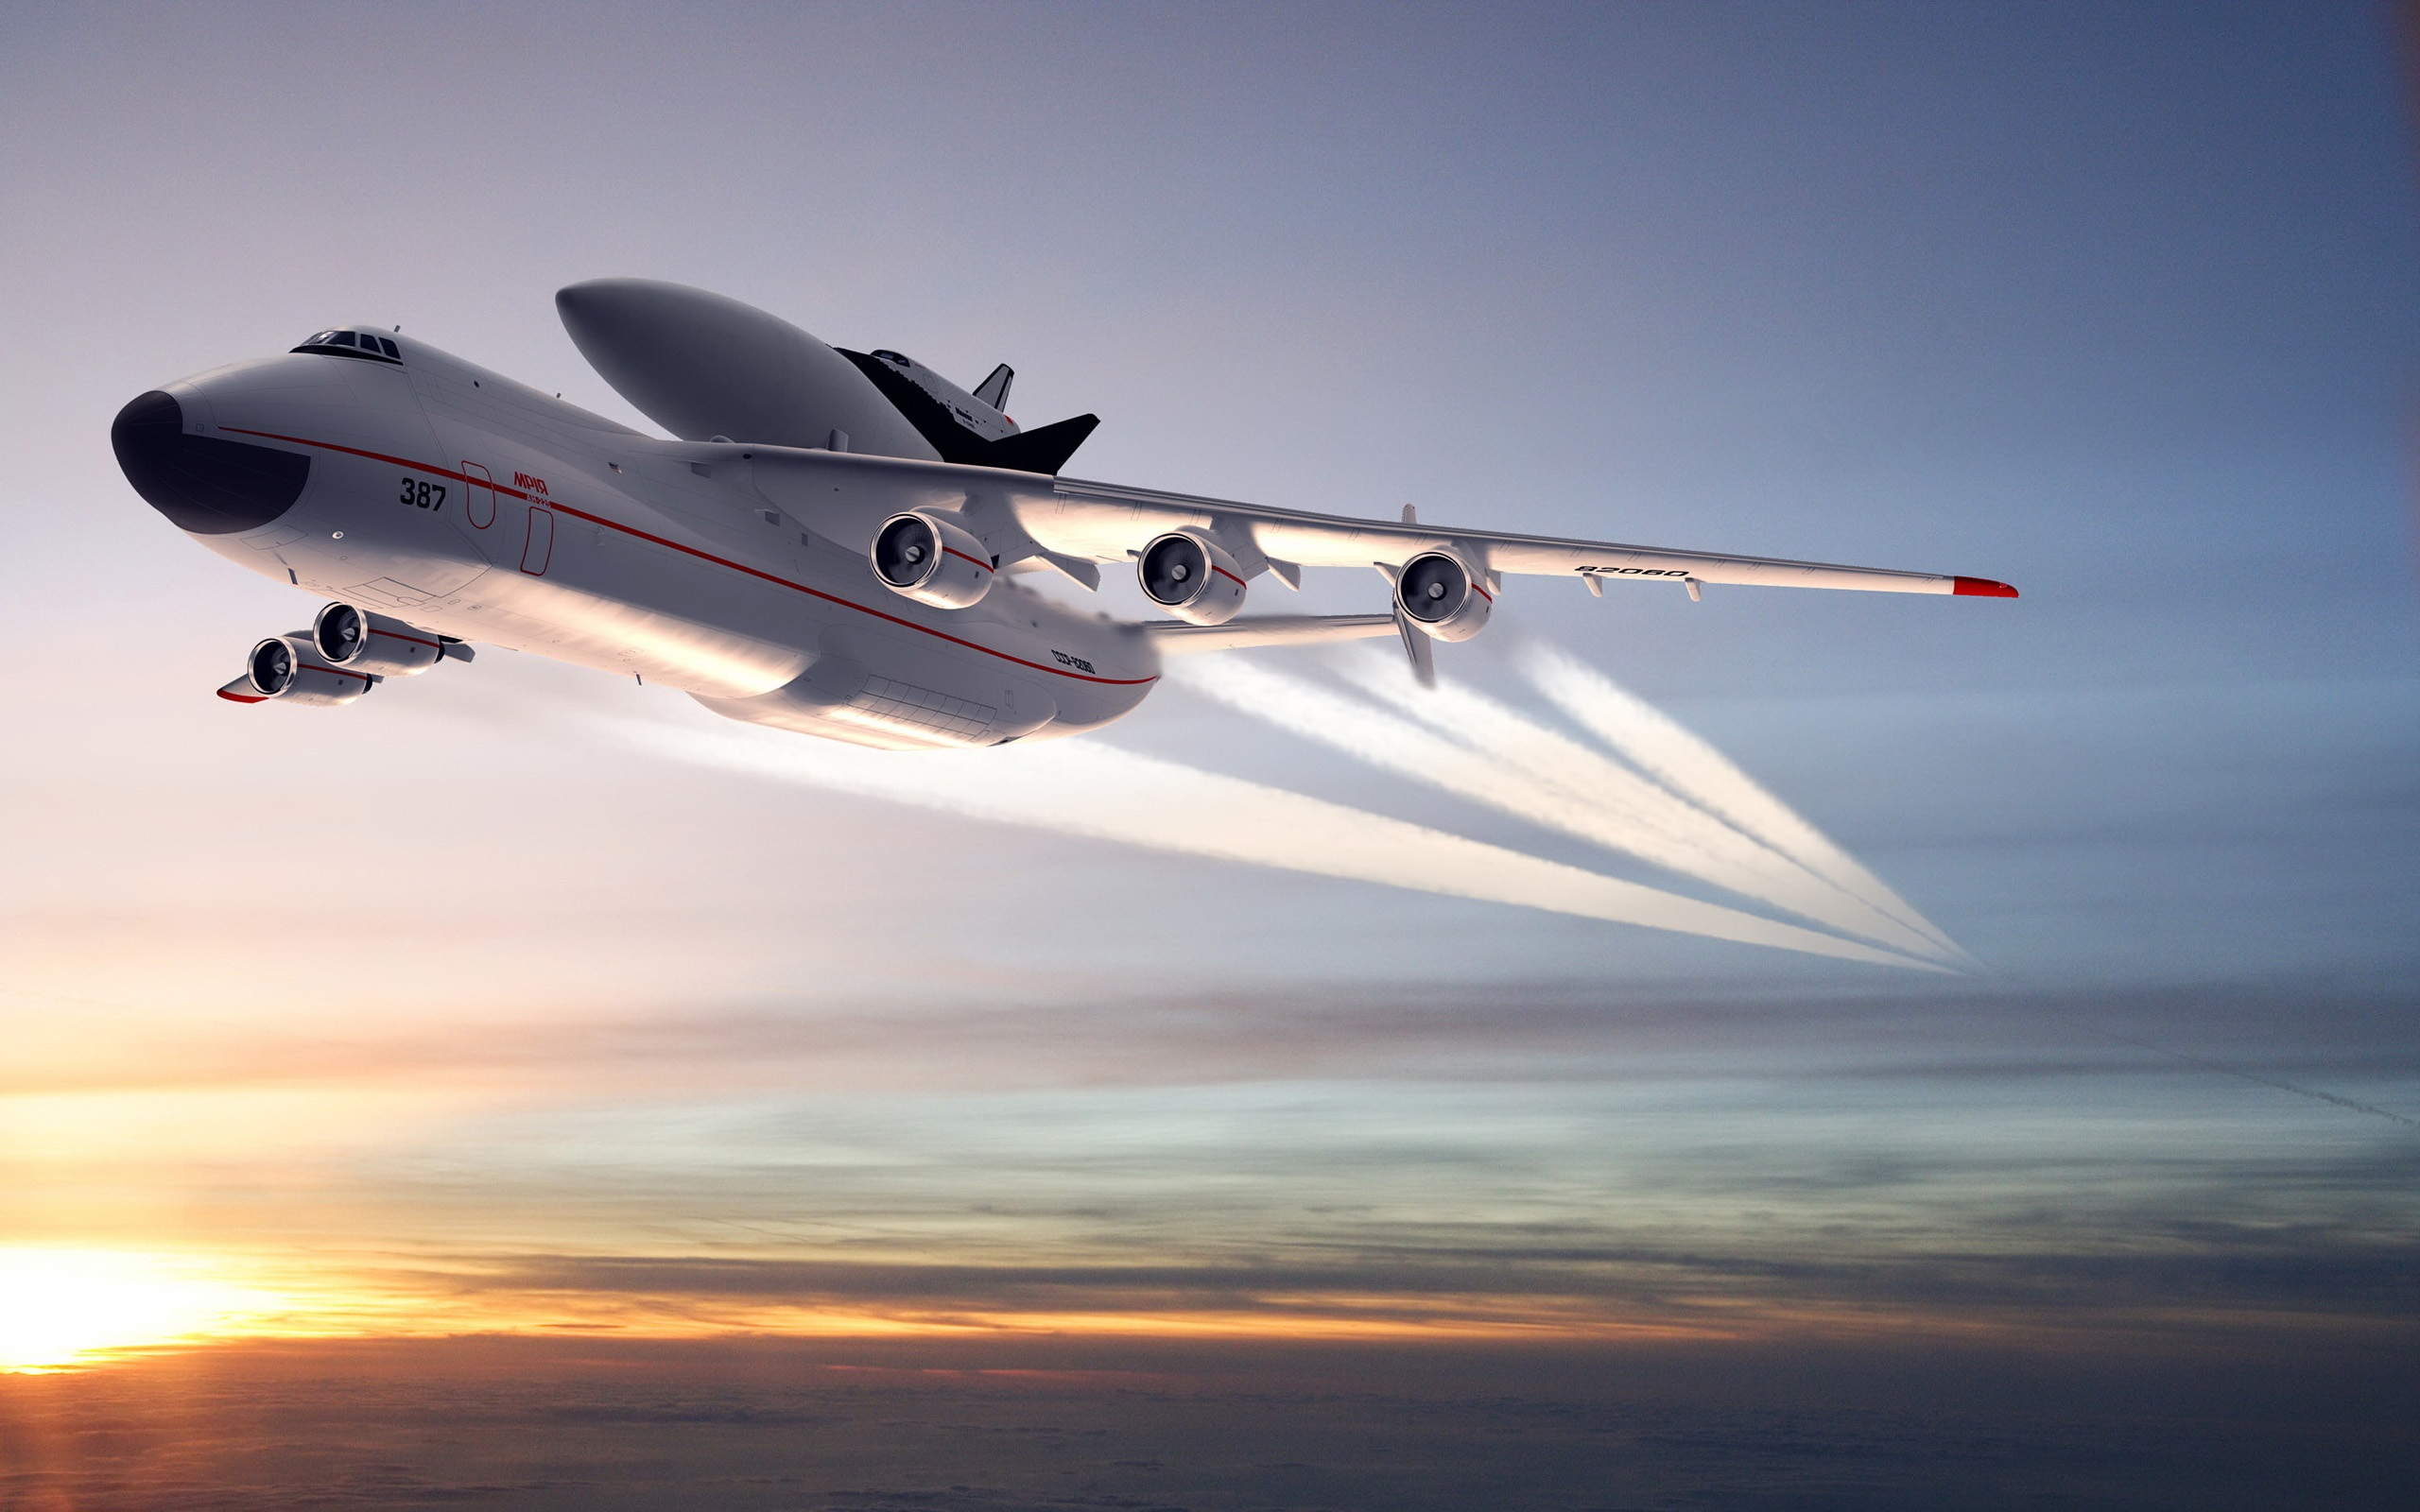 Antonov An-225 Mriya aircraft Wallpaper | 2560x1600 resolution